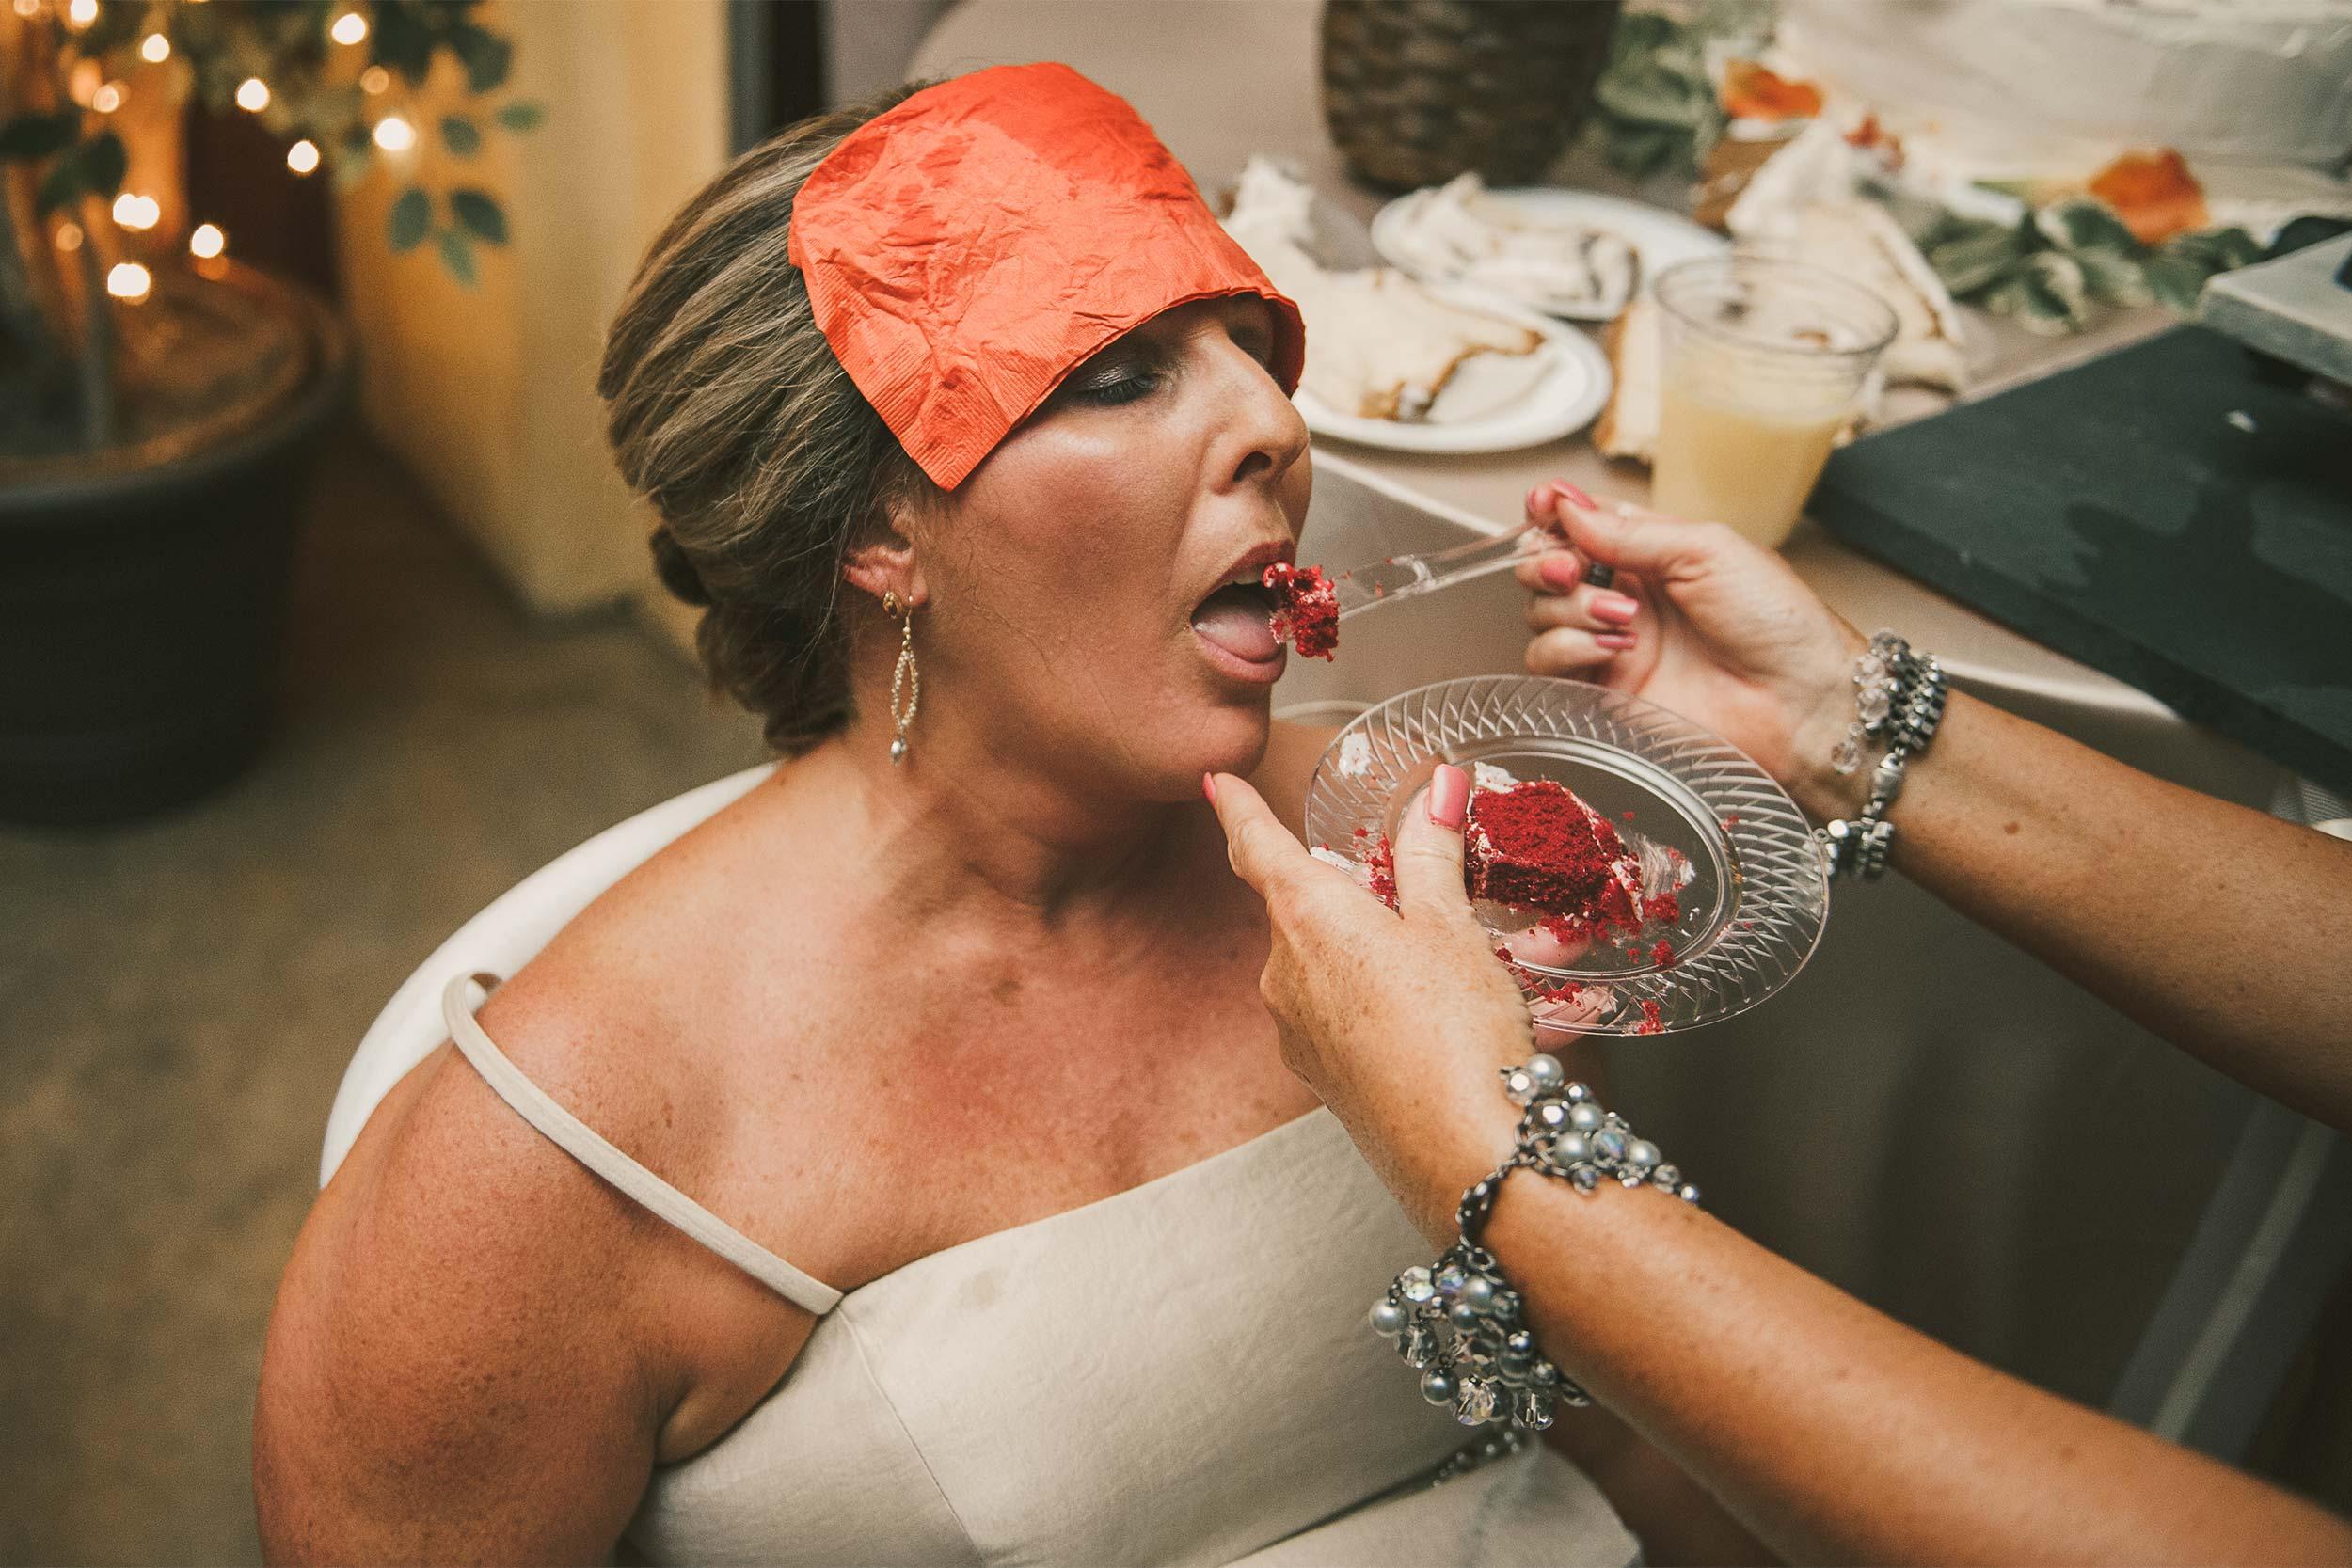 funny-wedding-reception-cake-shot.jpg